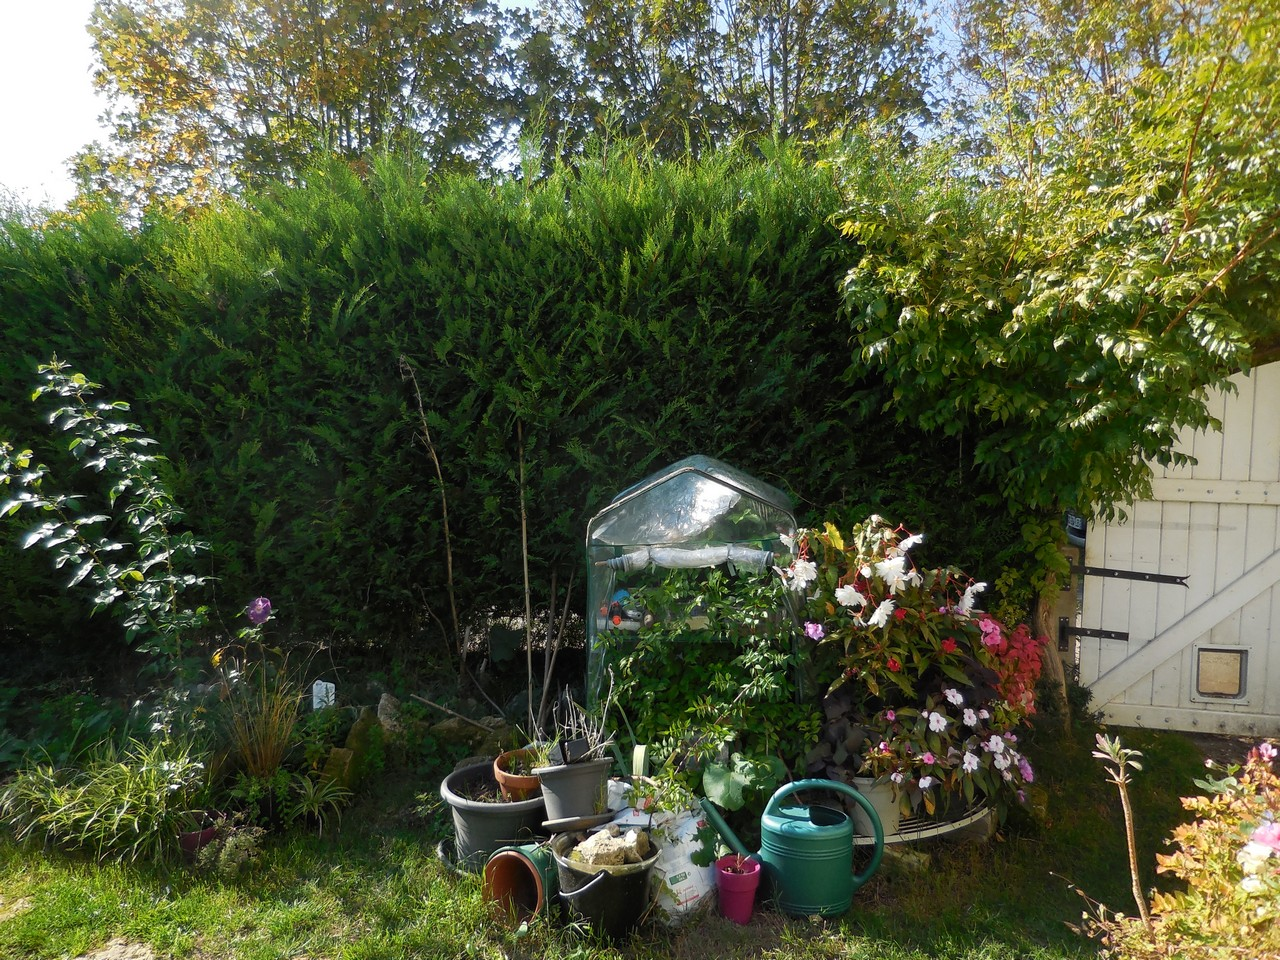 cagouille 39 s garden adieu la petite serre. Black Bedroom Furniture Sets. Home Design Ideas